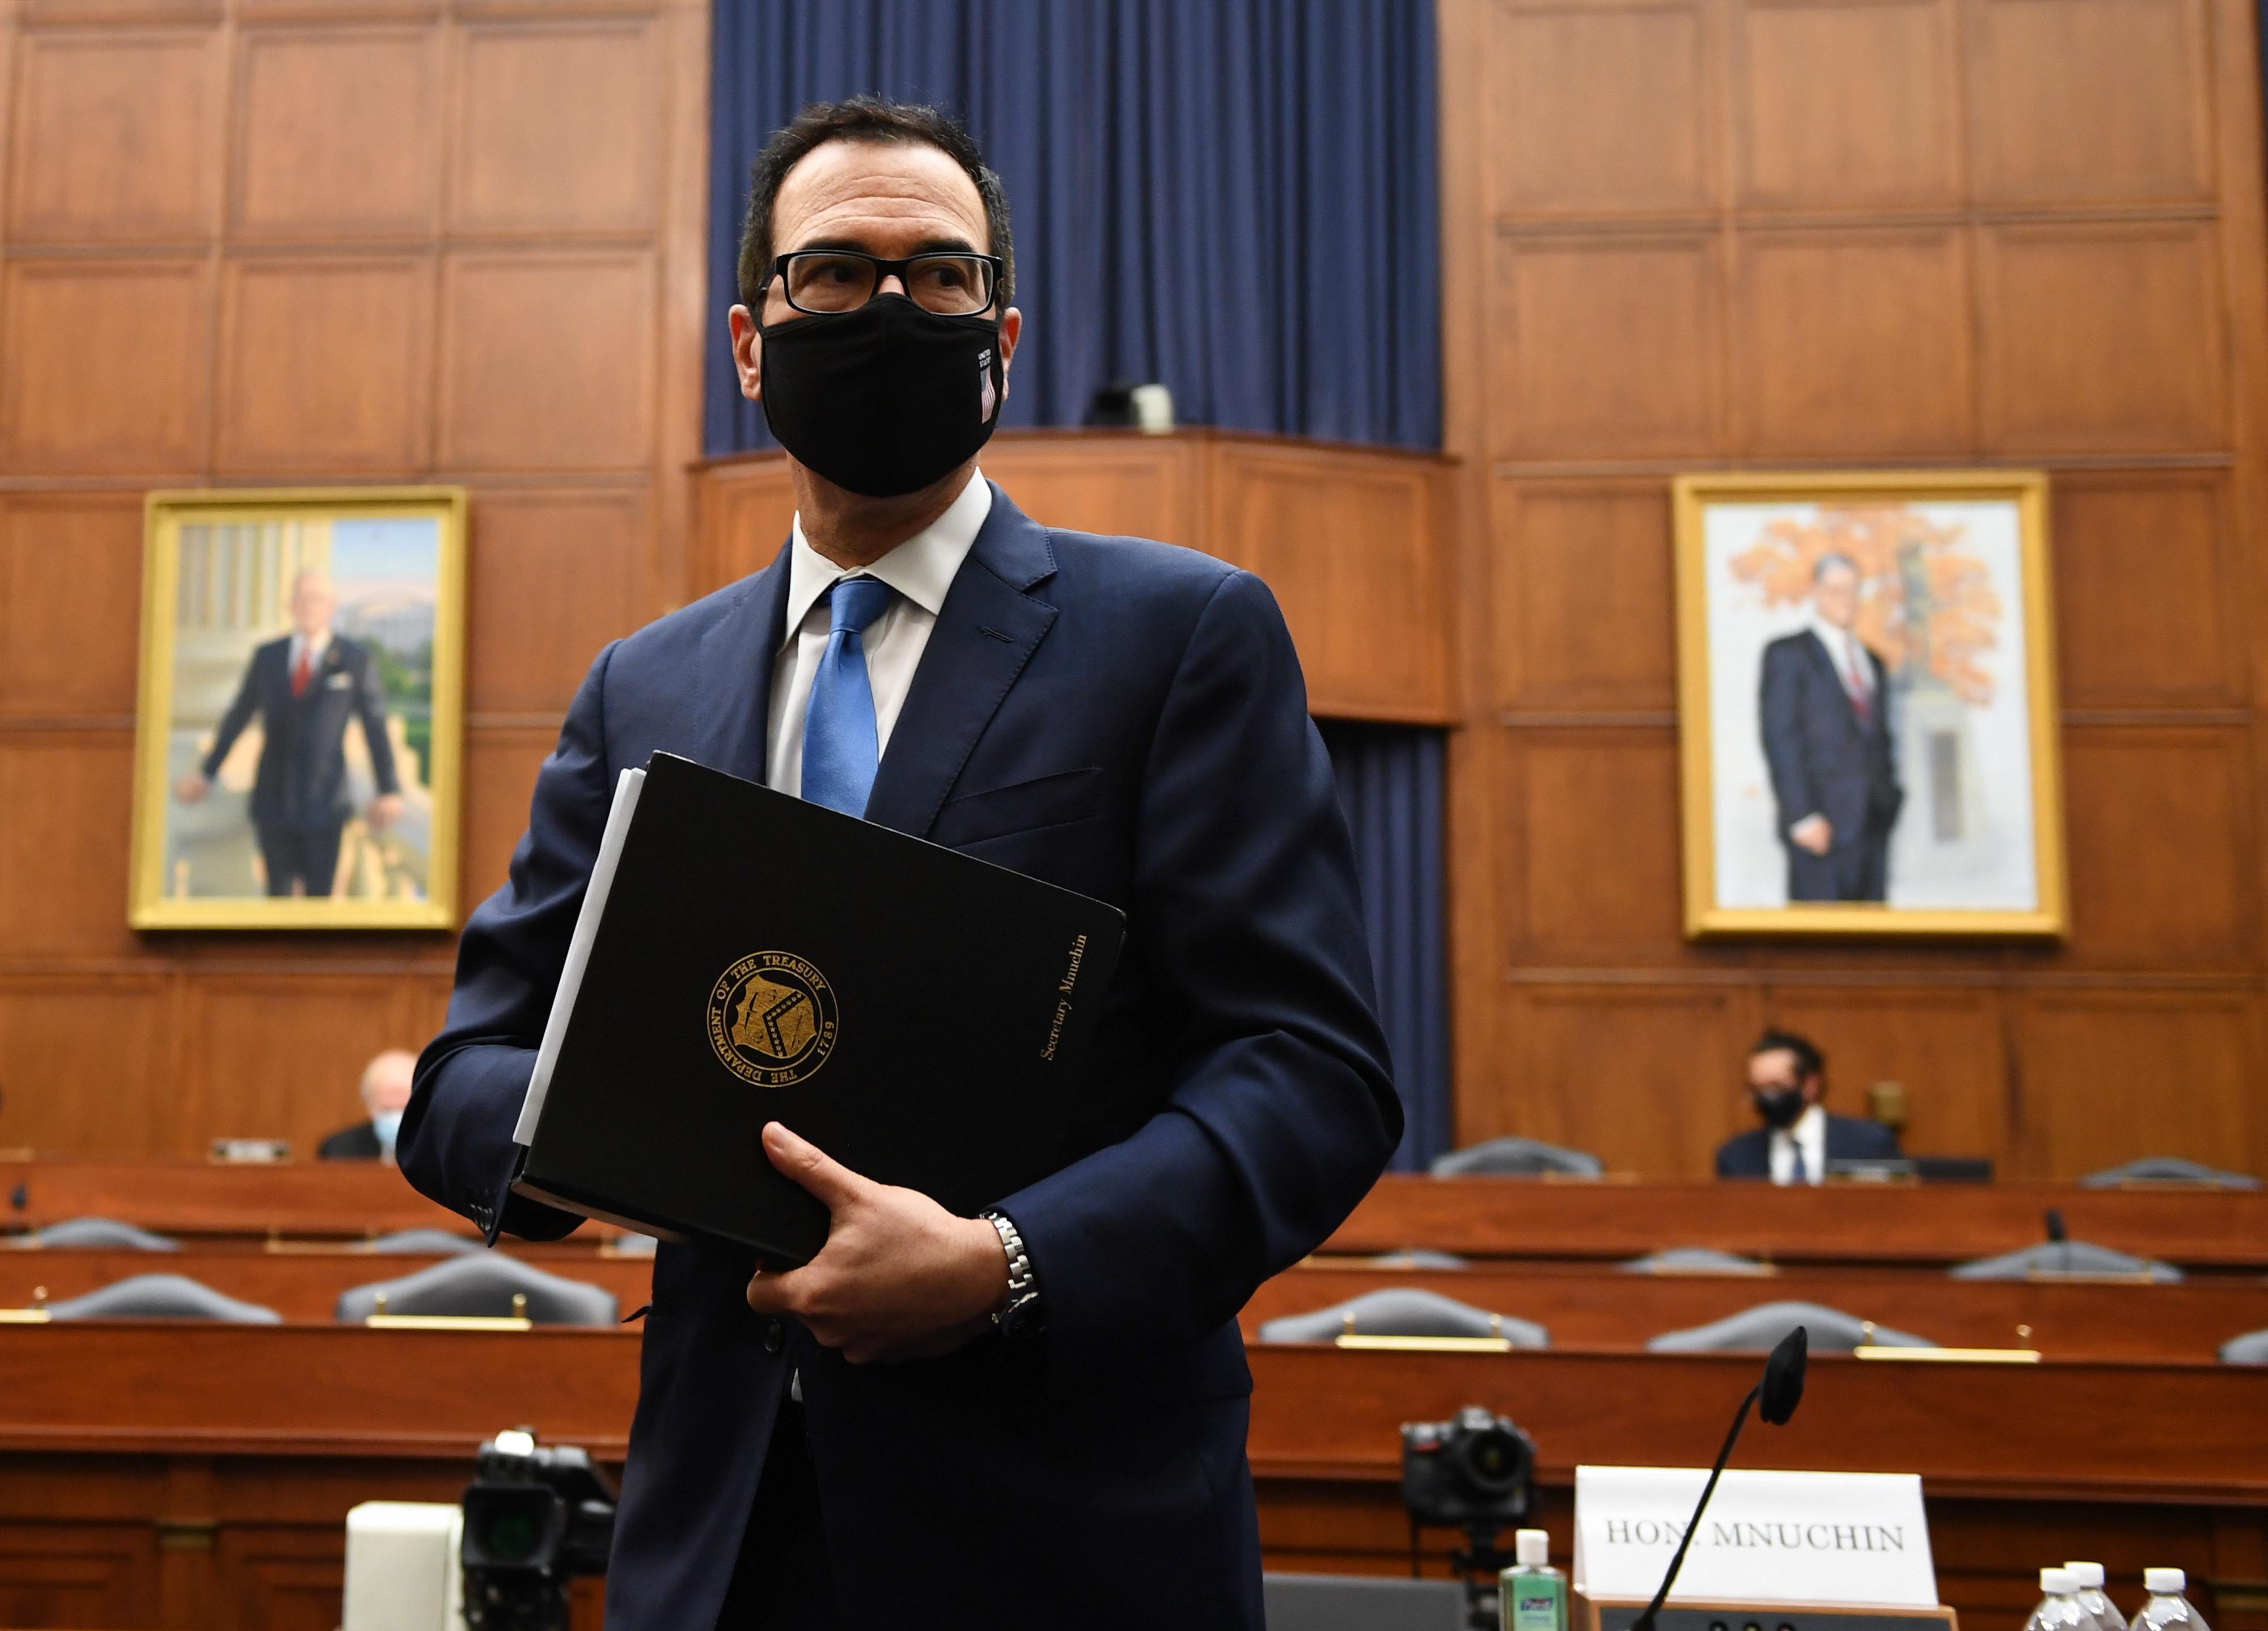 Treasury Secretary Steven Mnuchin stands after testifying in Washington, DC, on July 17.